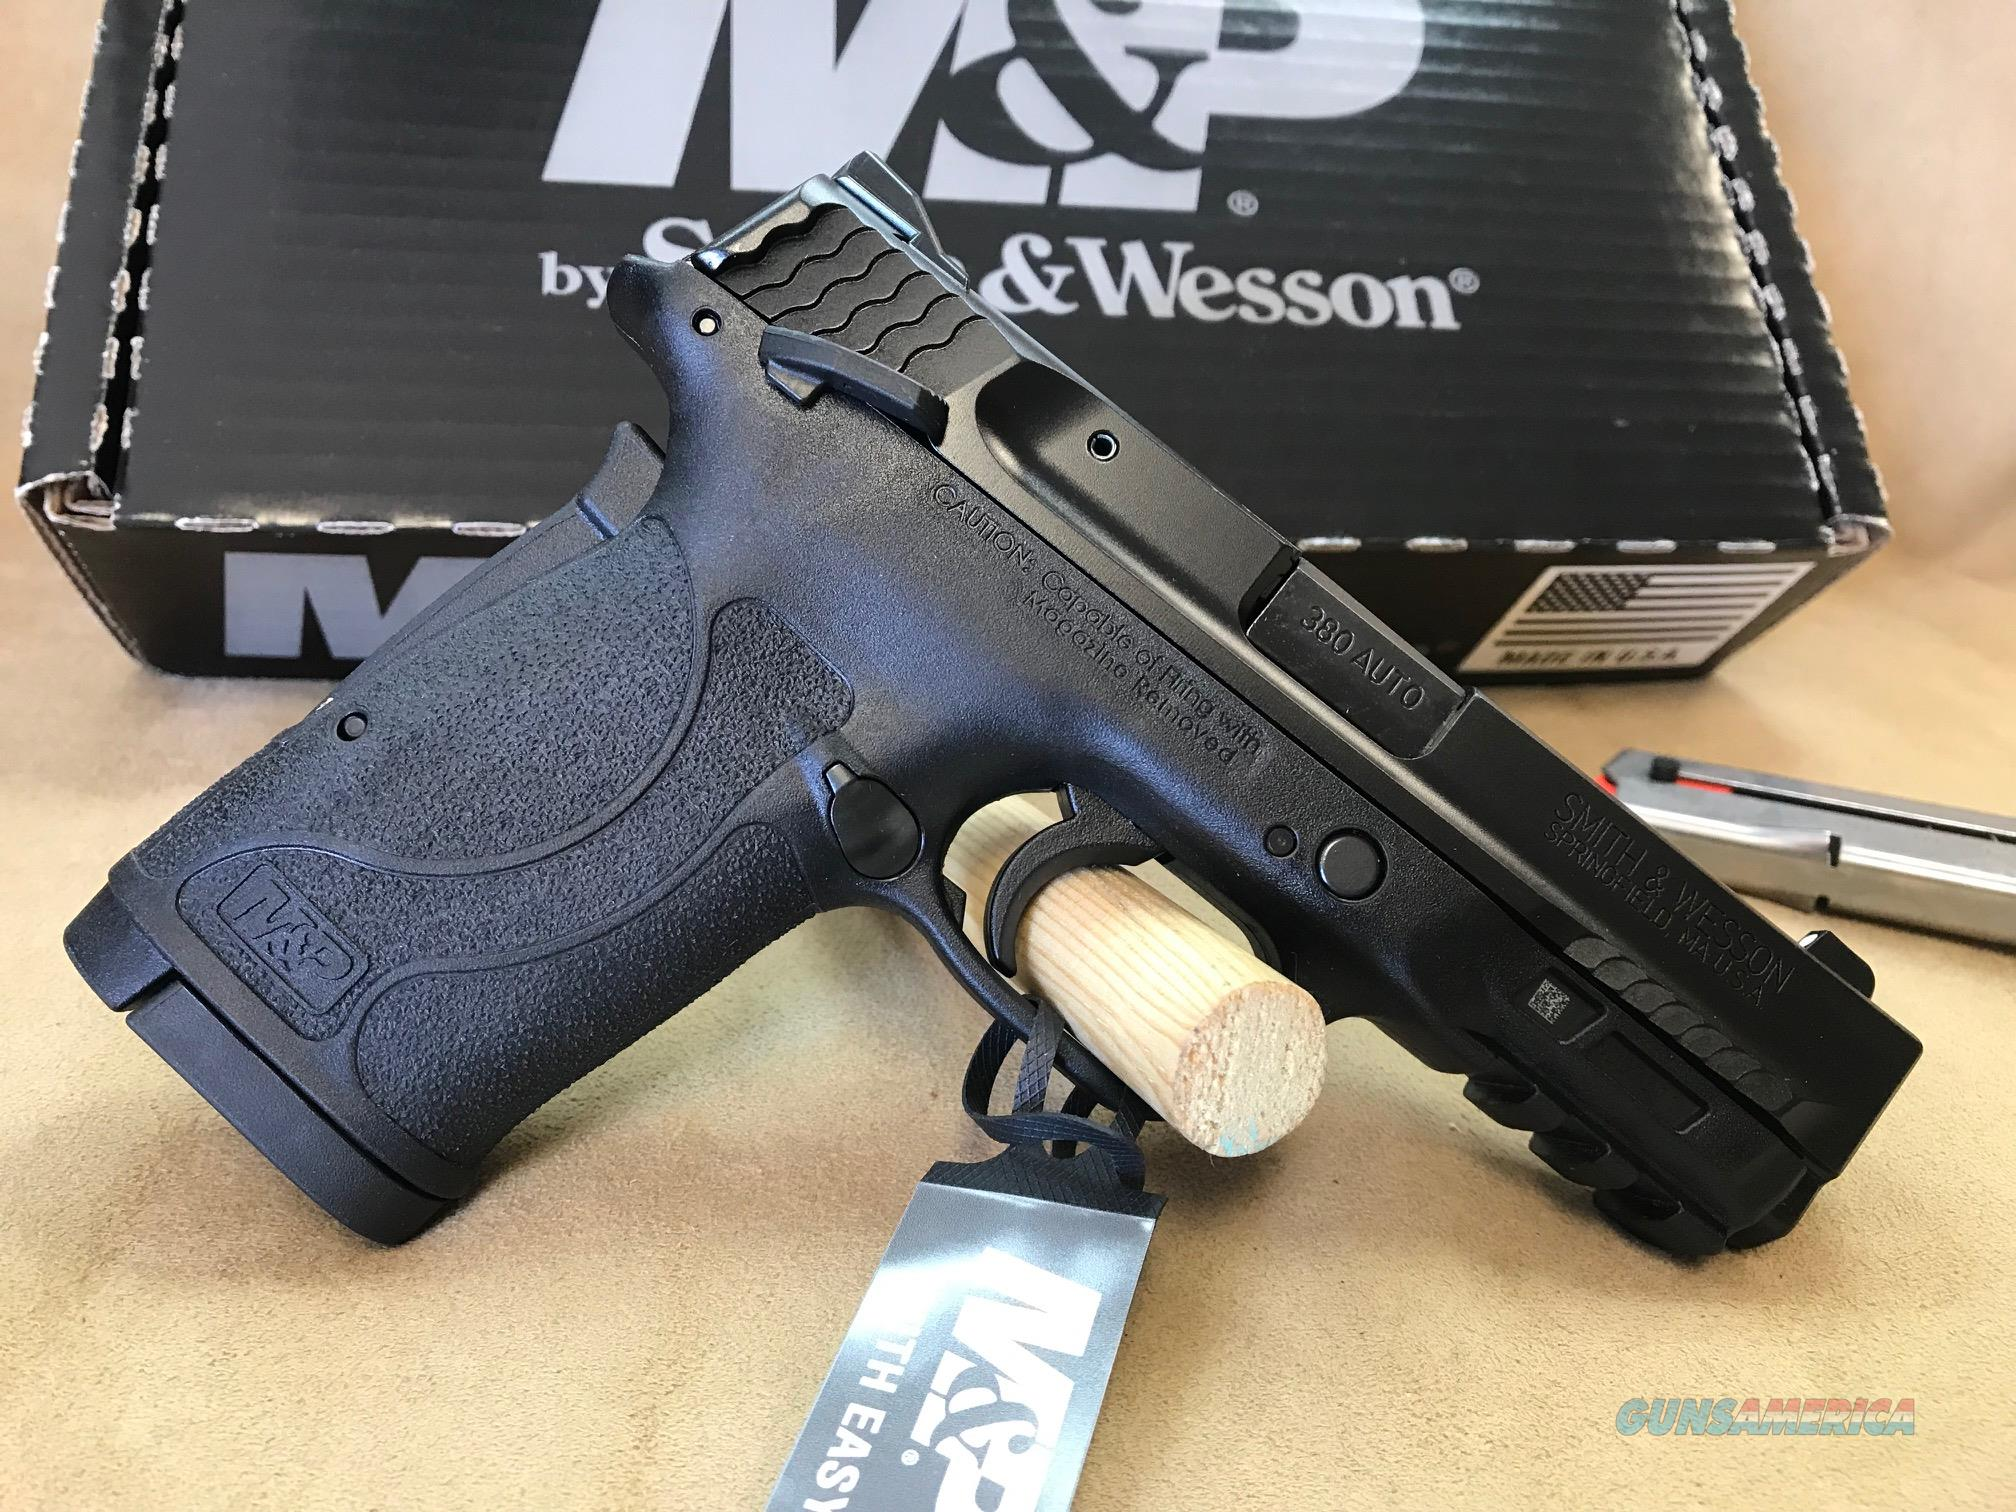 11663 Smith & Wesson M&P380 Shield EZ - 380 ACP  Guns > Pistols > Smith & Wesson Pistols - Autos > Shield